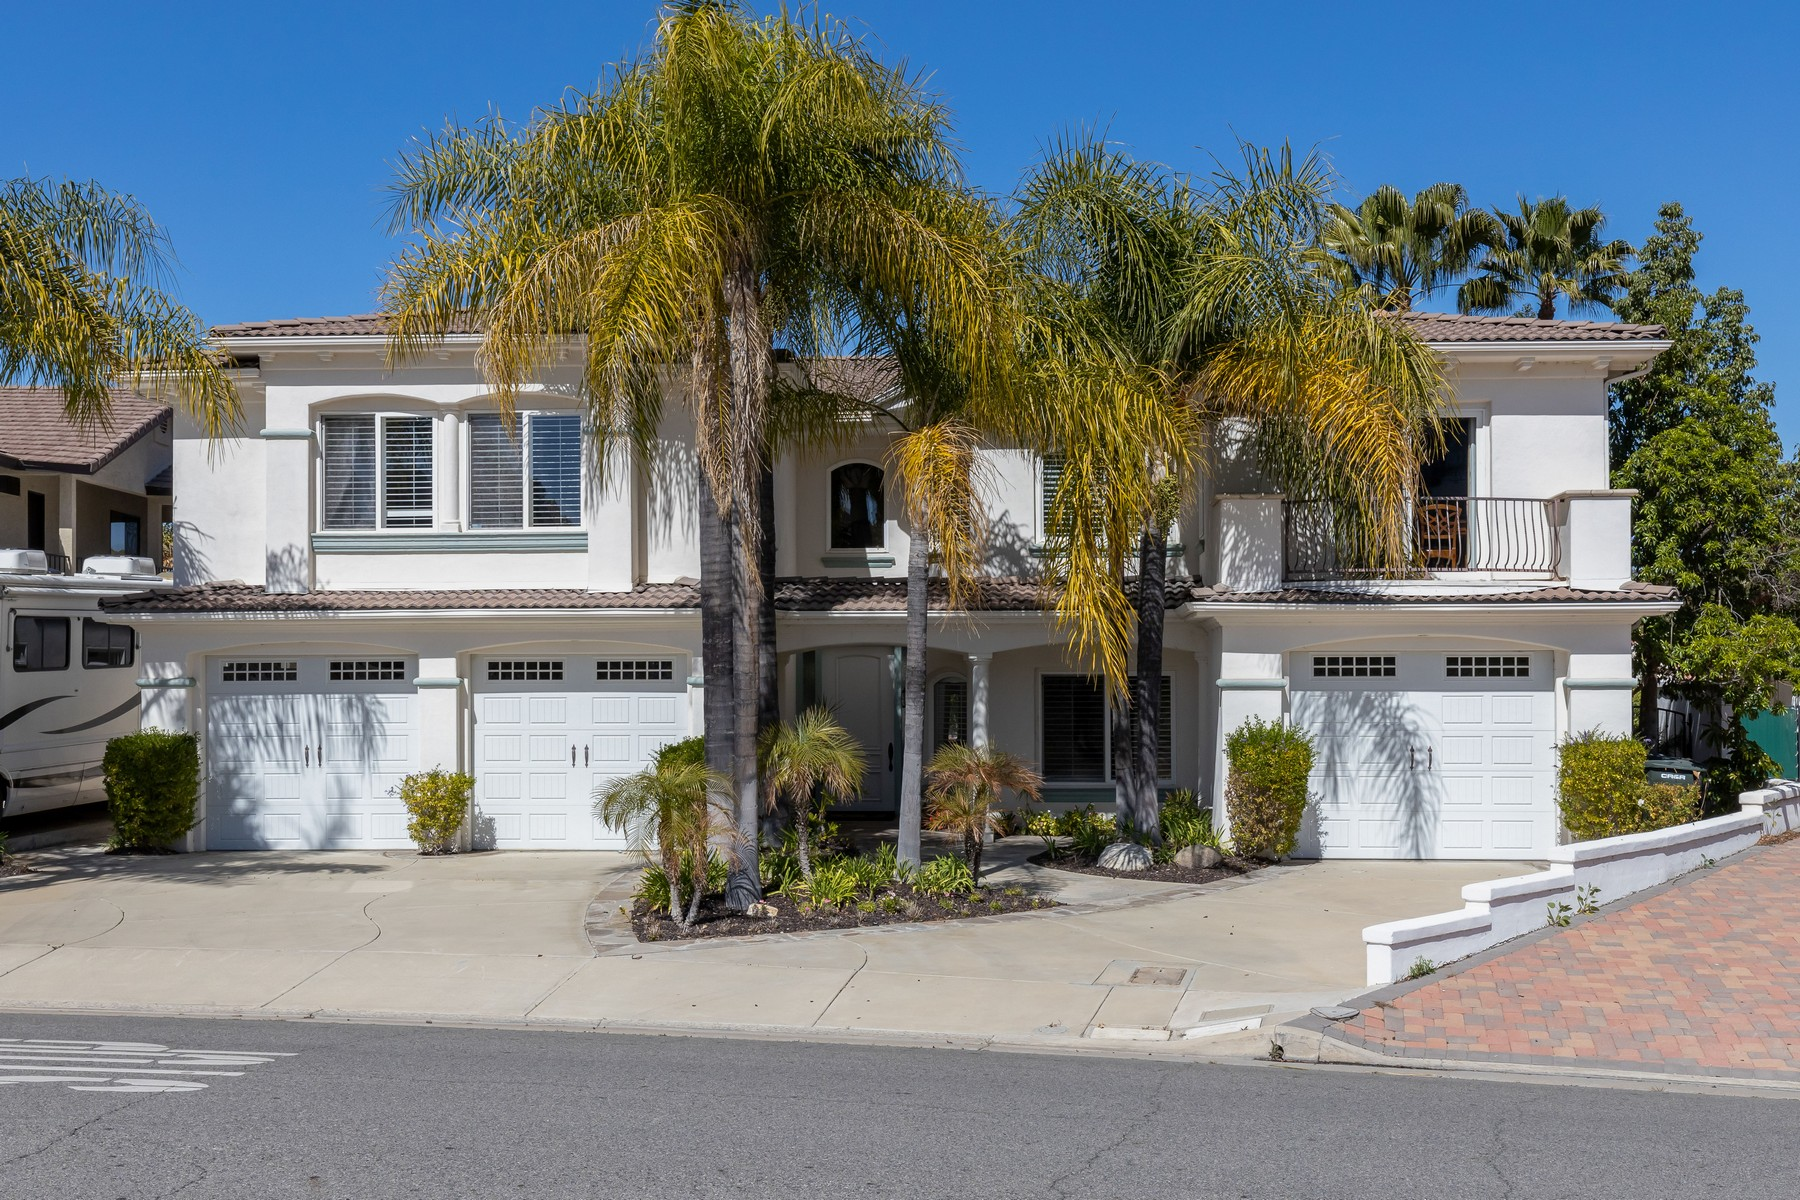 Single Family Homes for Active at Beautiful Waterfront Property 22818 Gray Fox Drive Canyon Lake, California 92587 United States